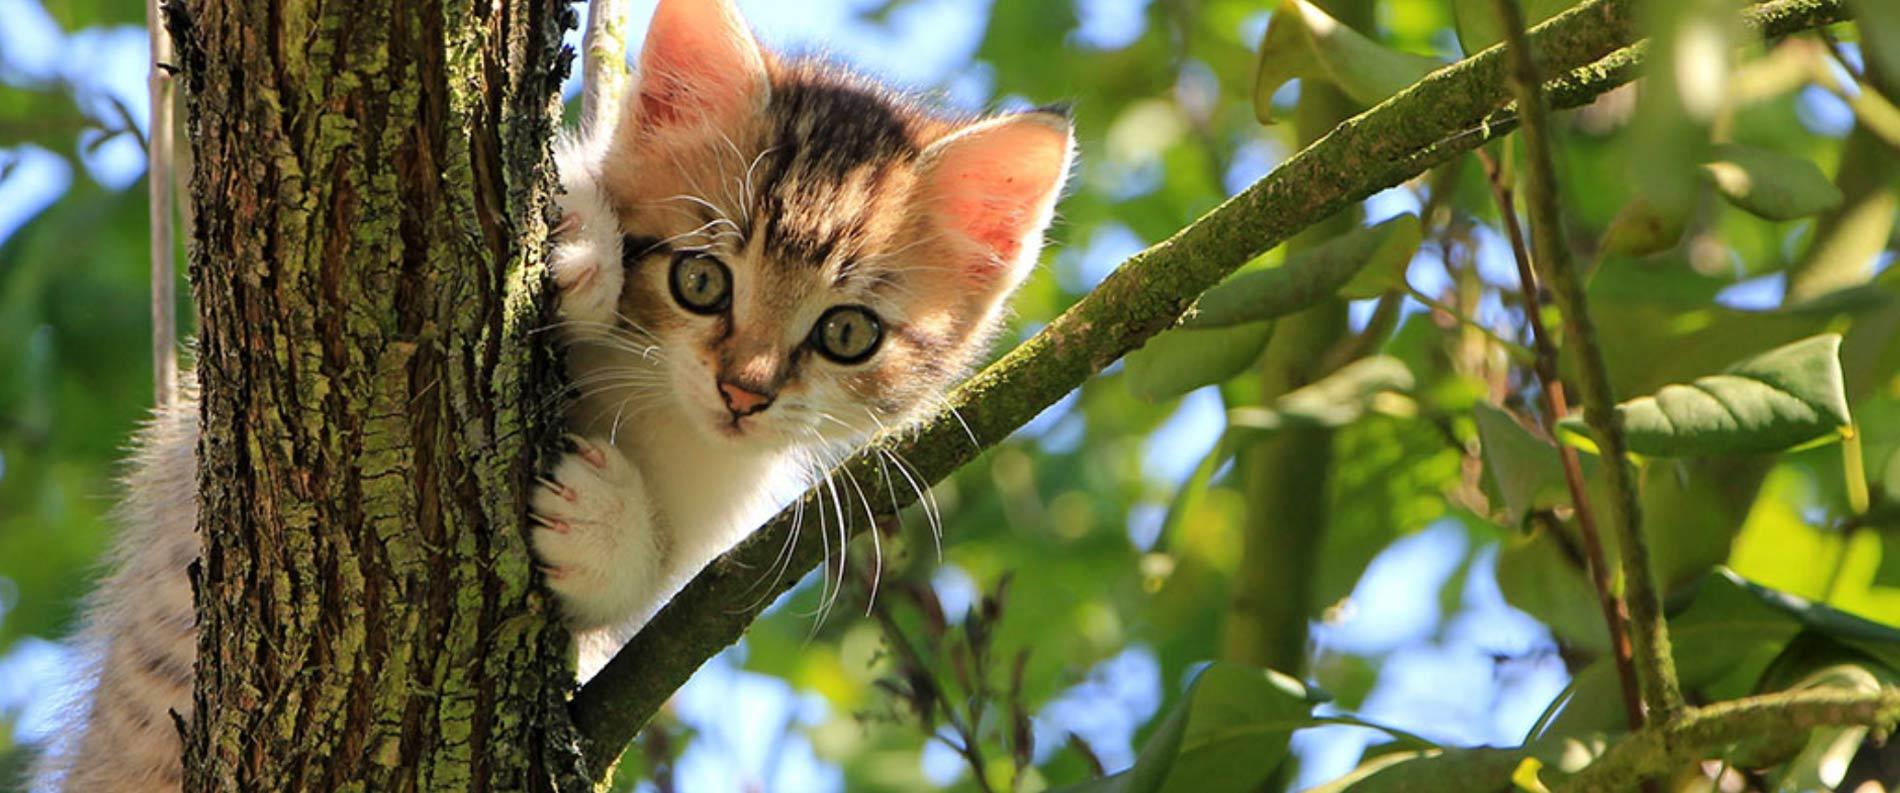 Naturbelassener Zeckenschutz für Katzen